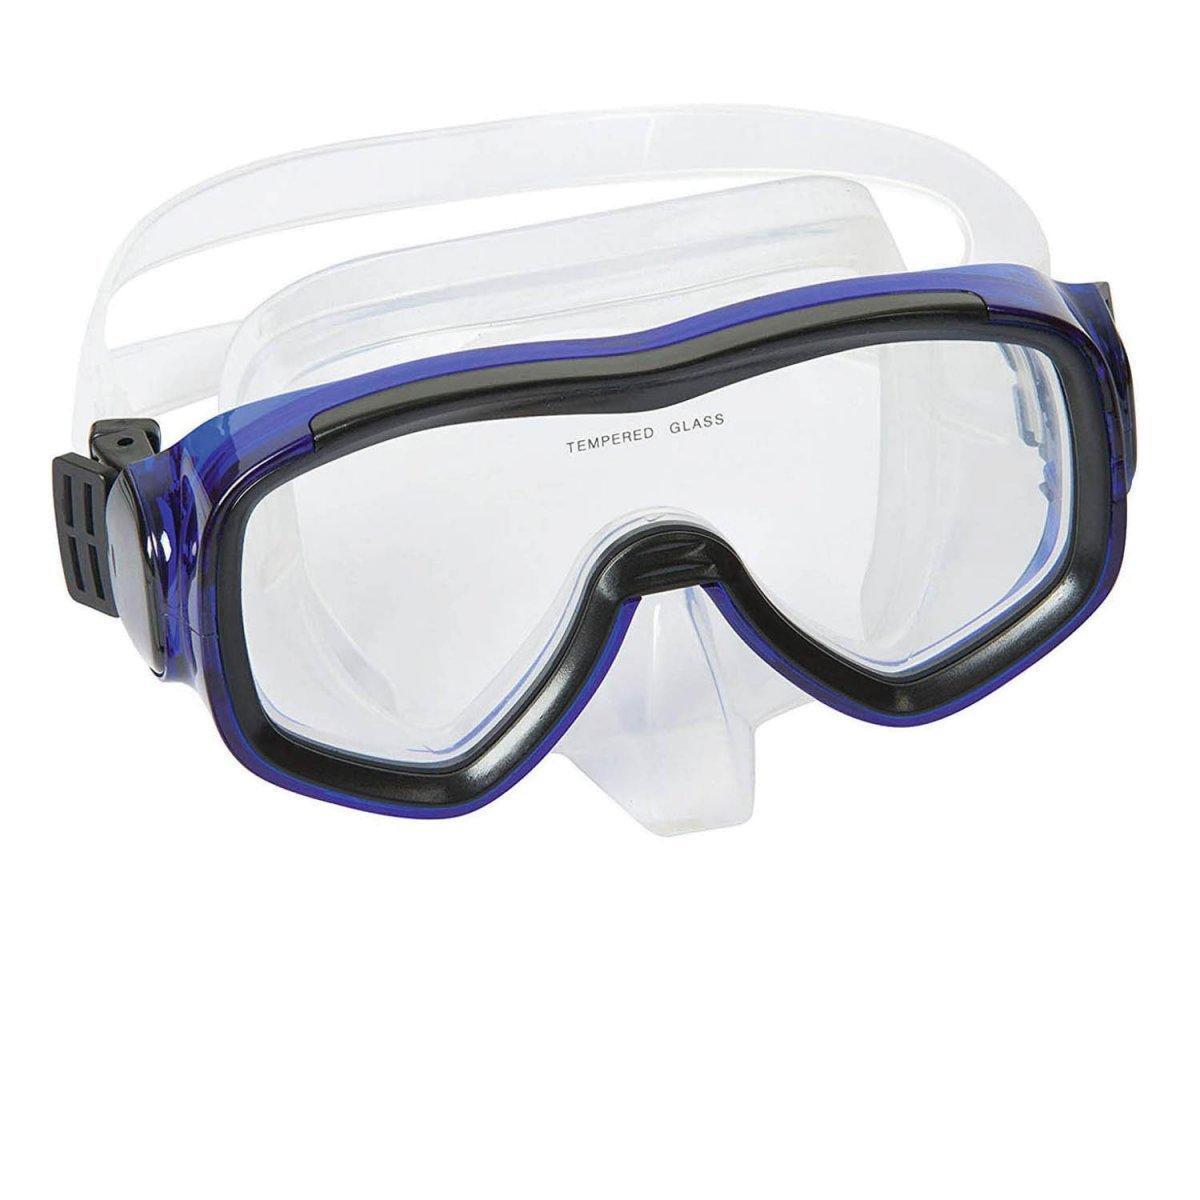 Маска для плавания Bestway 22018, размер XXL, (14+), обхват головы ≈ 59 см, синий